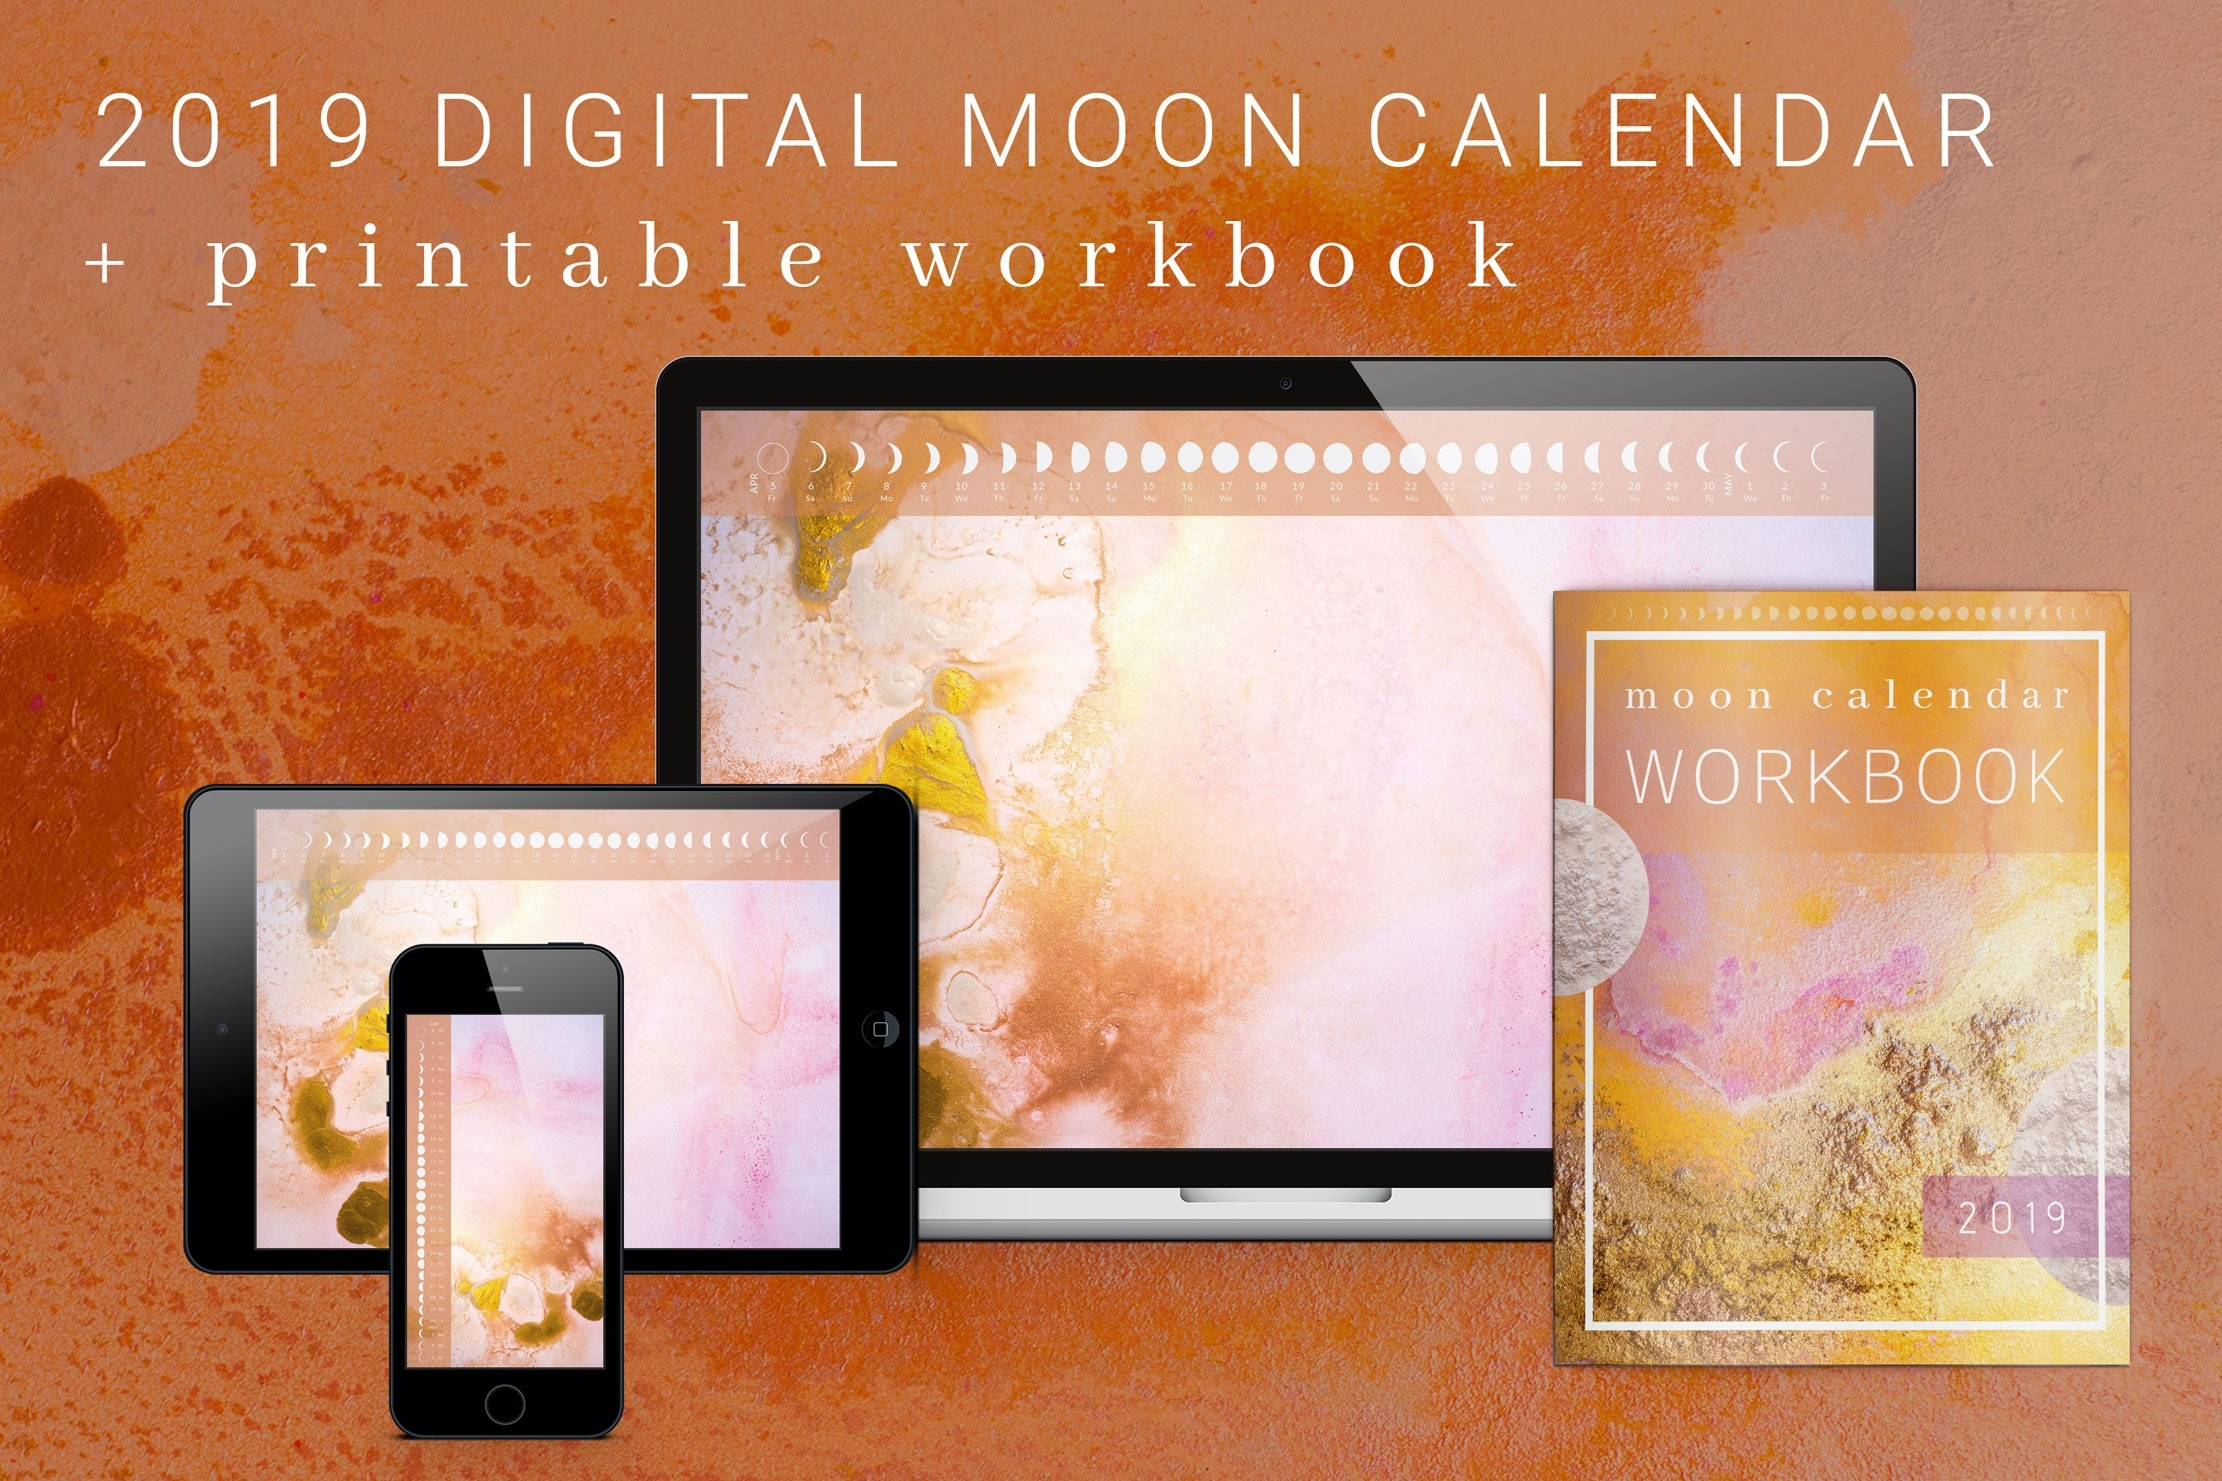 Moon Calendar - Dream Inspired Design  Desktop Calendar With Lunar Cycle